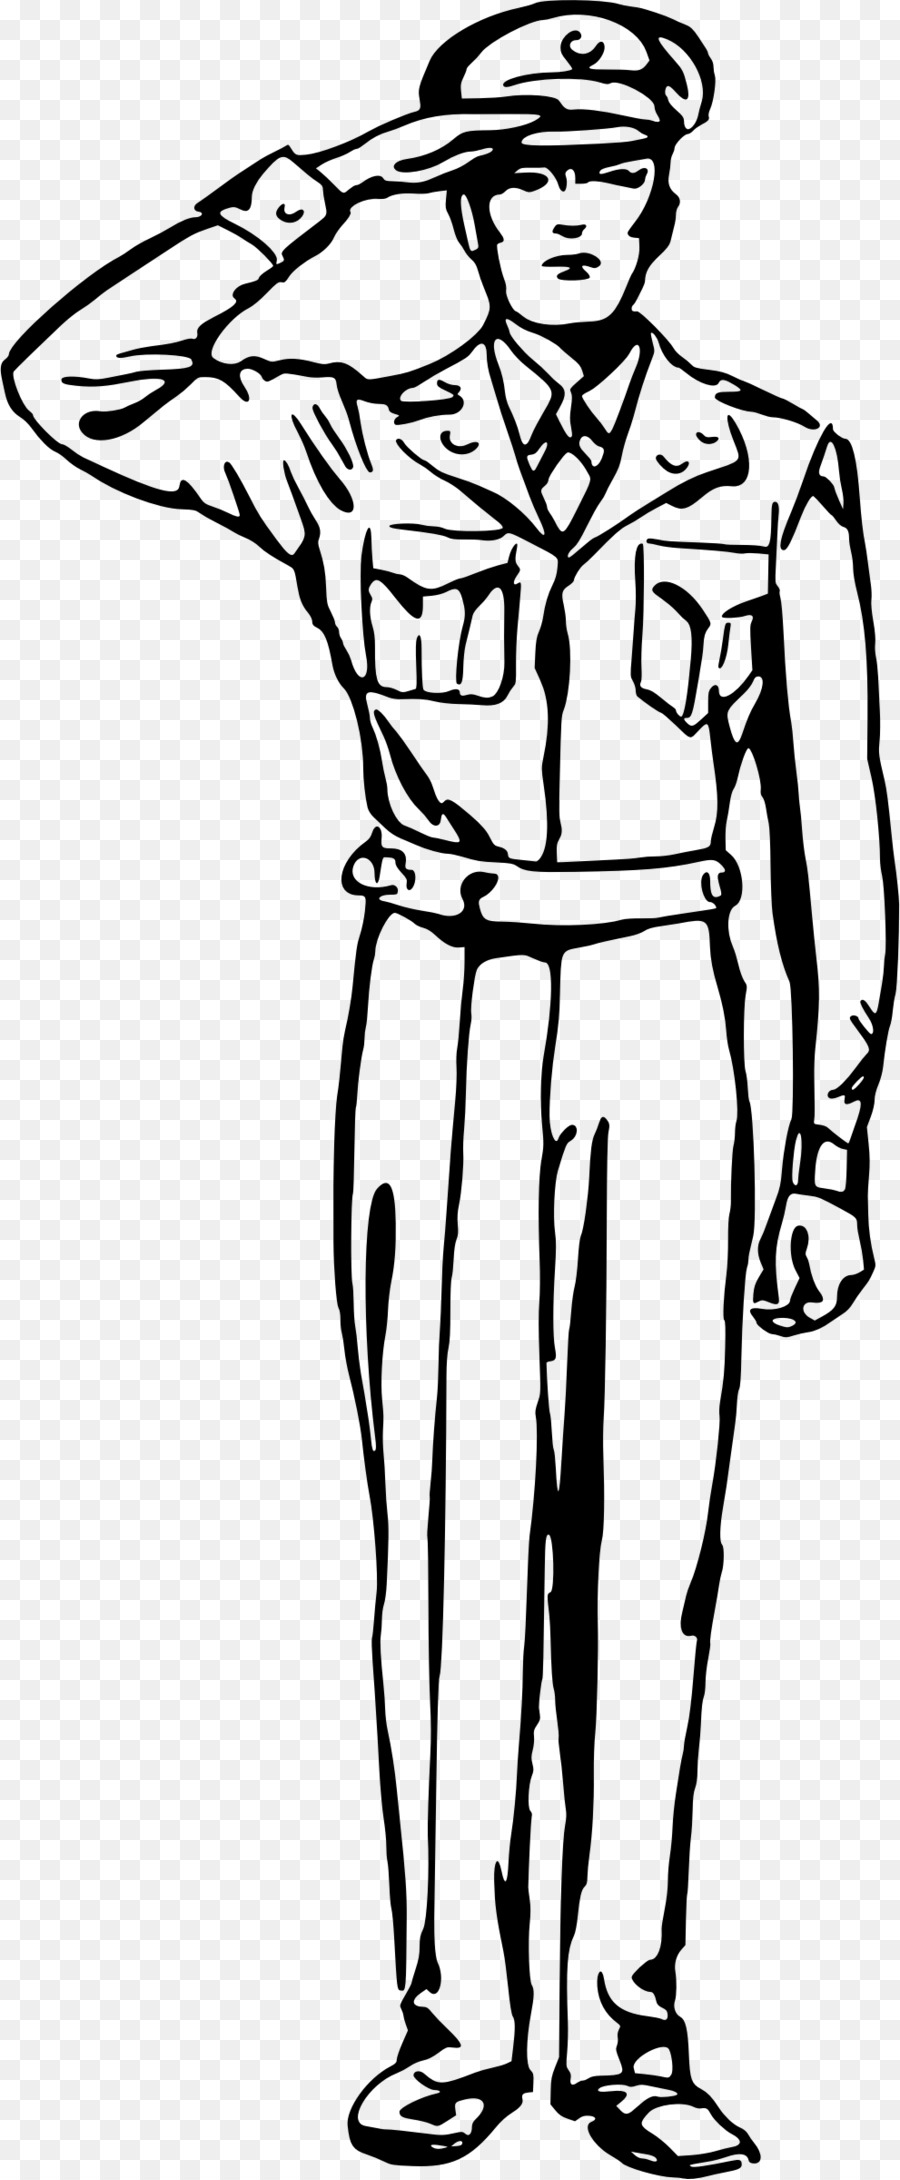 Clipart saluting clip transparent Man Cartoon clipart - Soldier, Drawing, Army, transparent clip art clip transparent